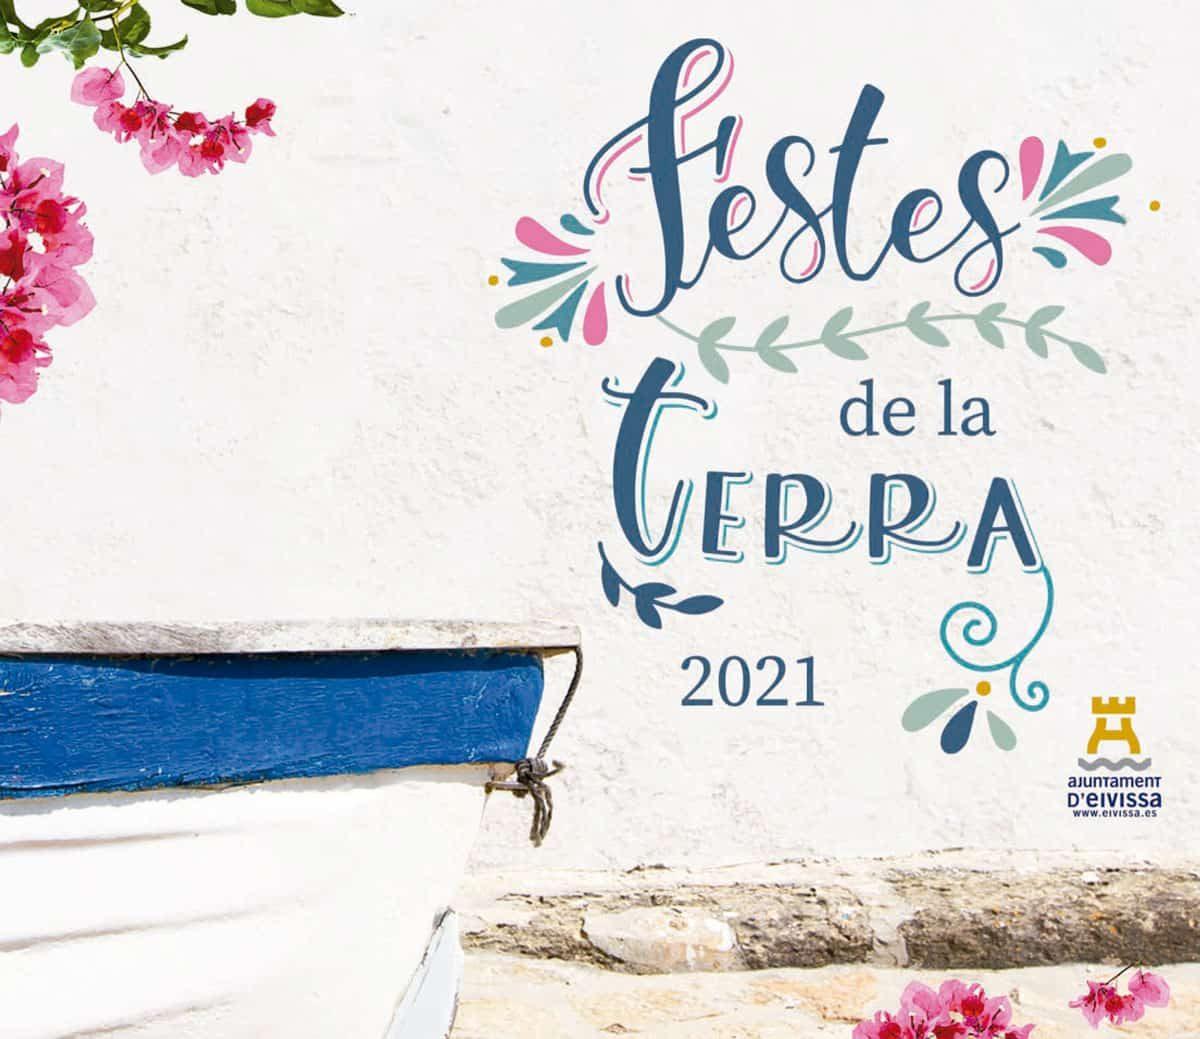 festivals-de-la-tierra-ibiza-2021-welcometoibiza